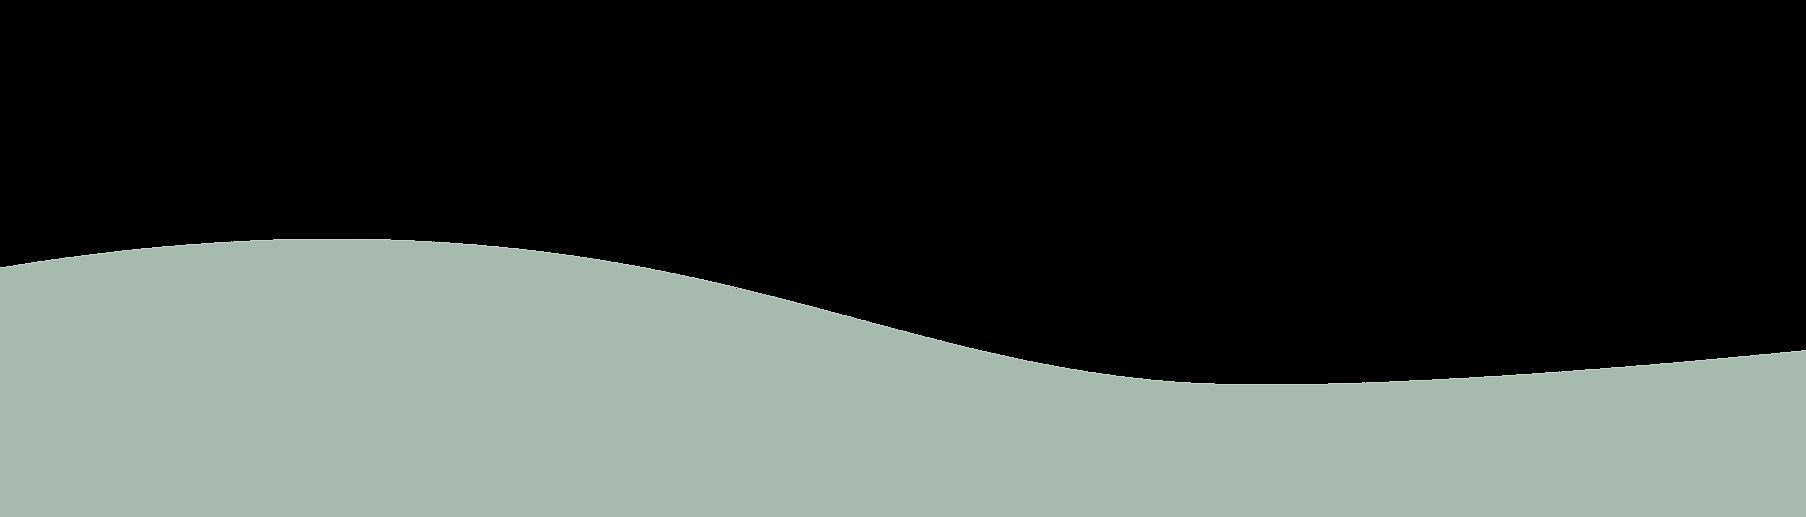 wavy divider bottom-01.png